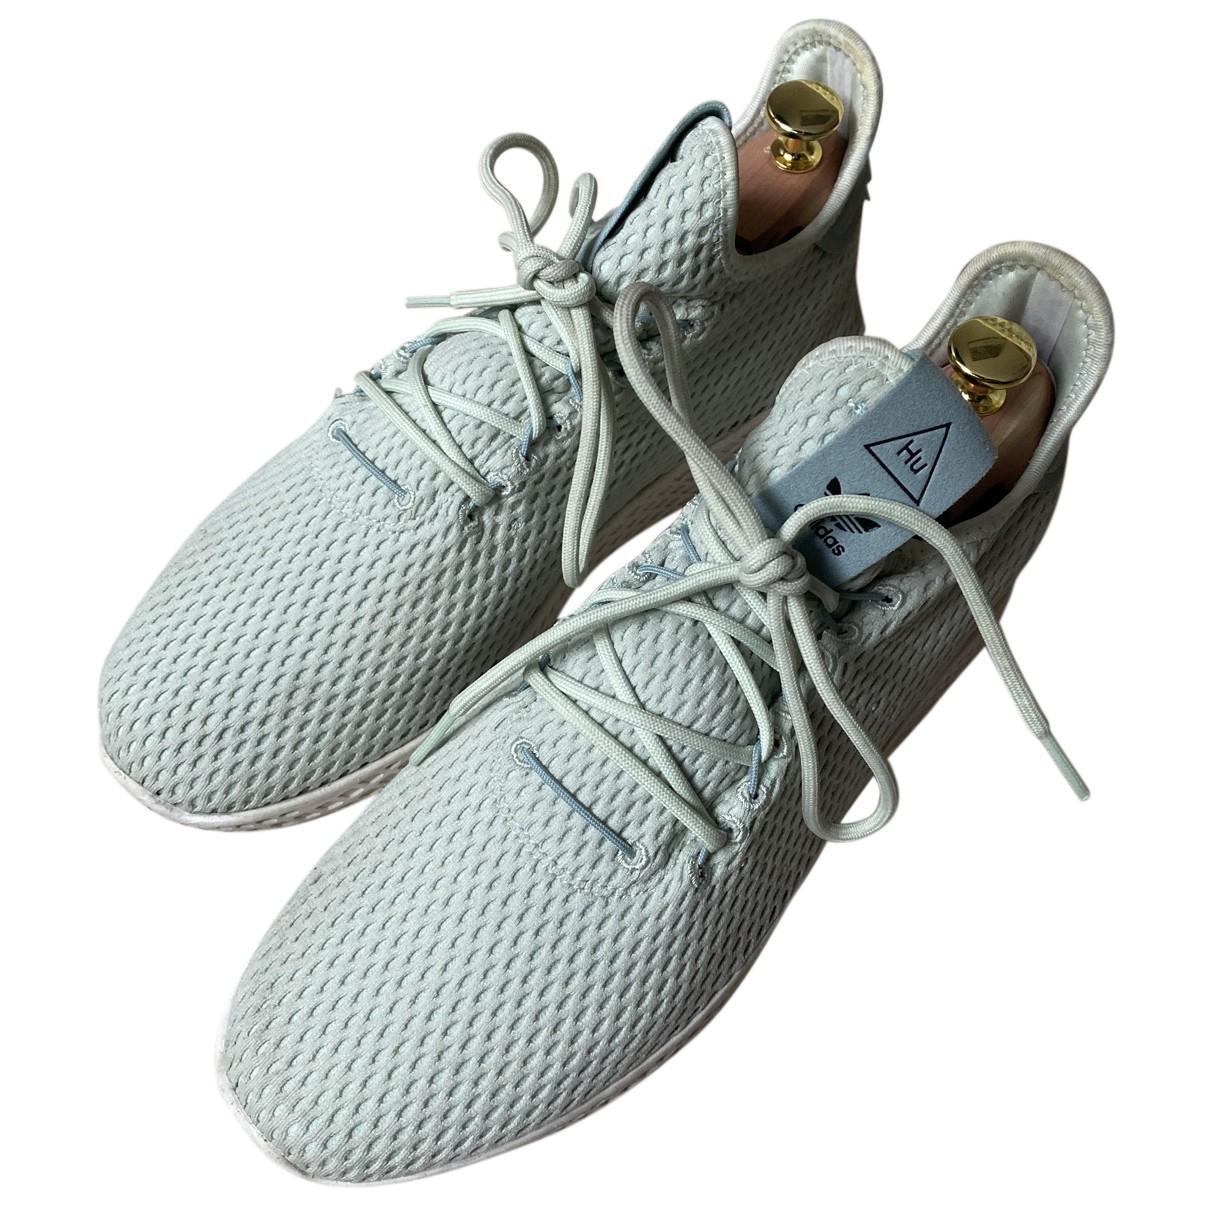 Adidas X Pharrell Williams \N Sneakers in  Gruen Leinen